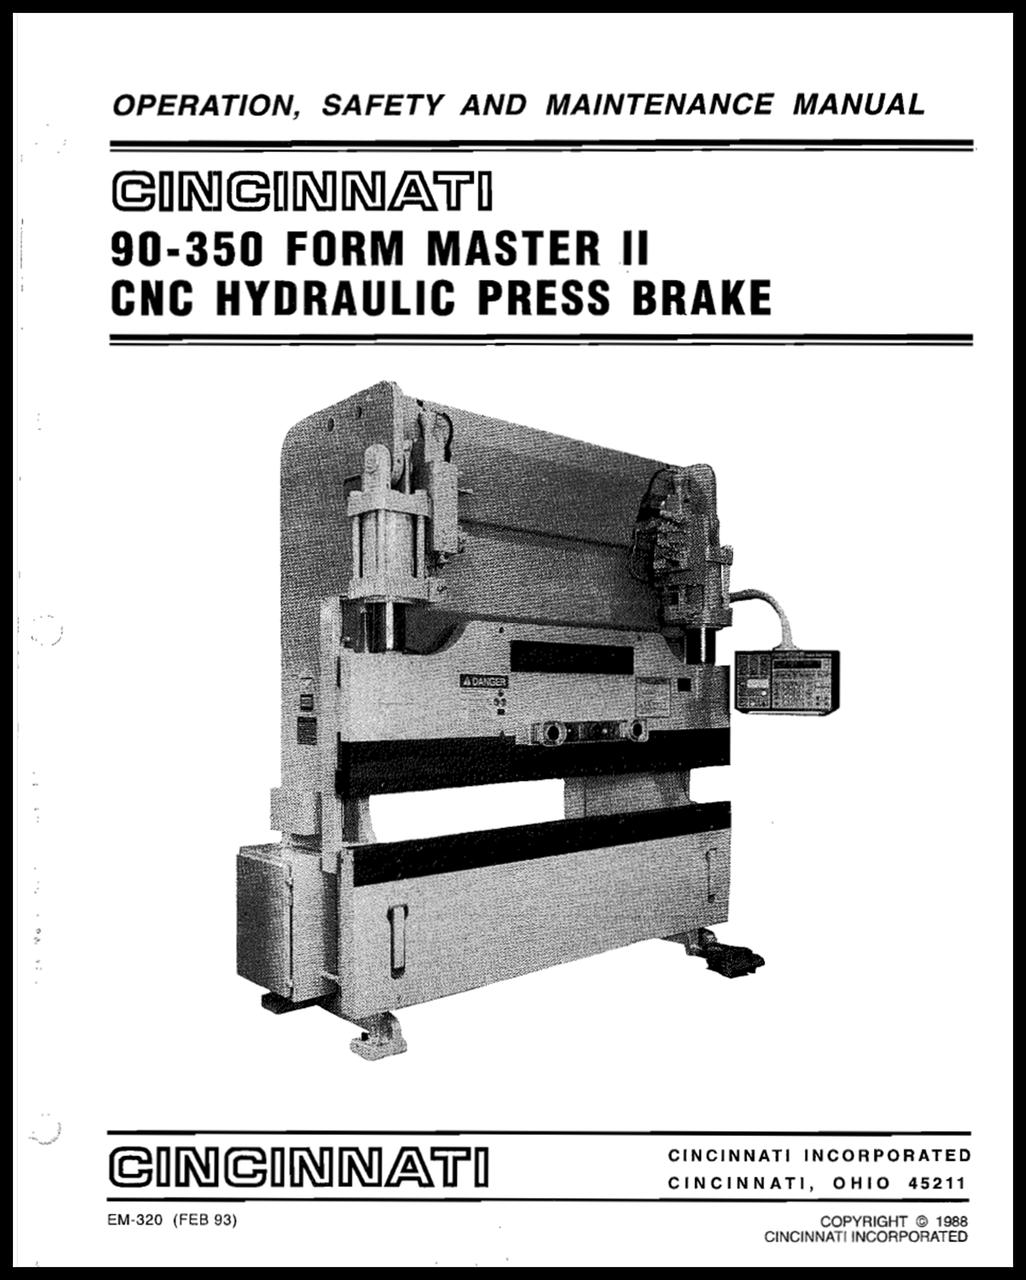 EM-320 (R-02-93) 90-350 FMII Hydraulic Press Brake Operation, Safety and Maintenance Manual